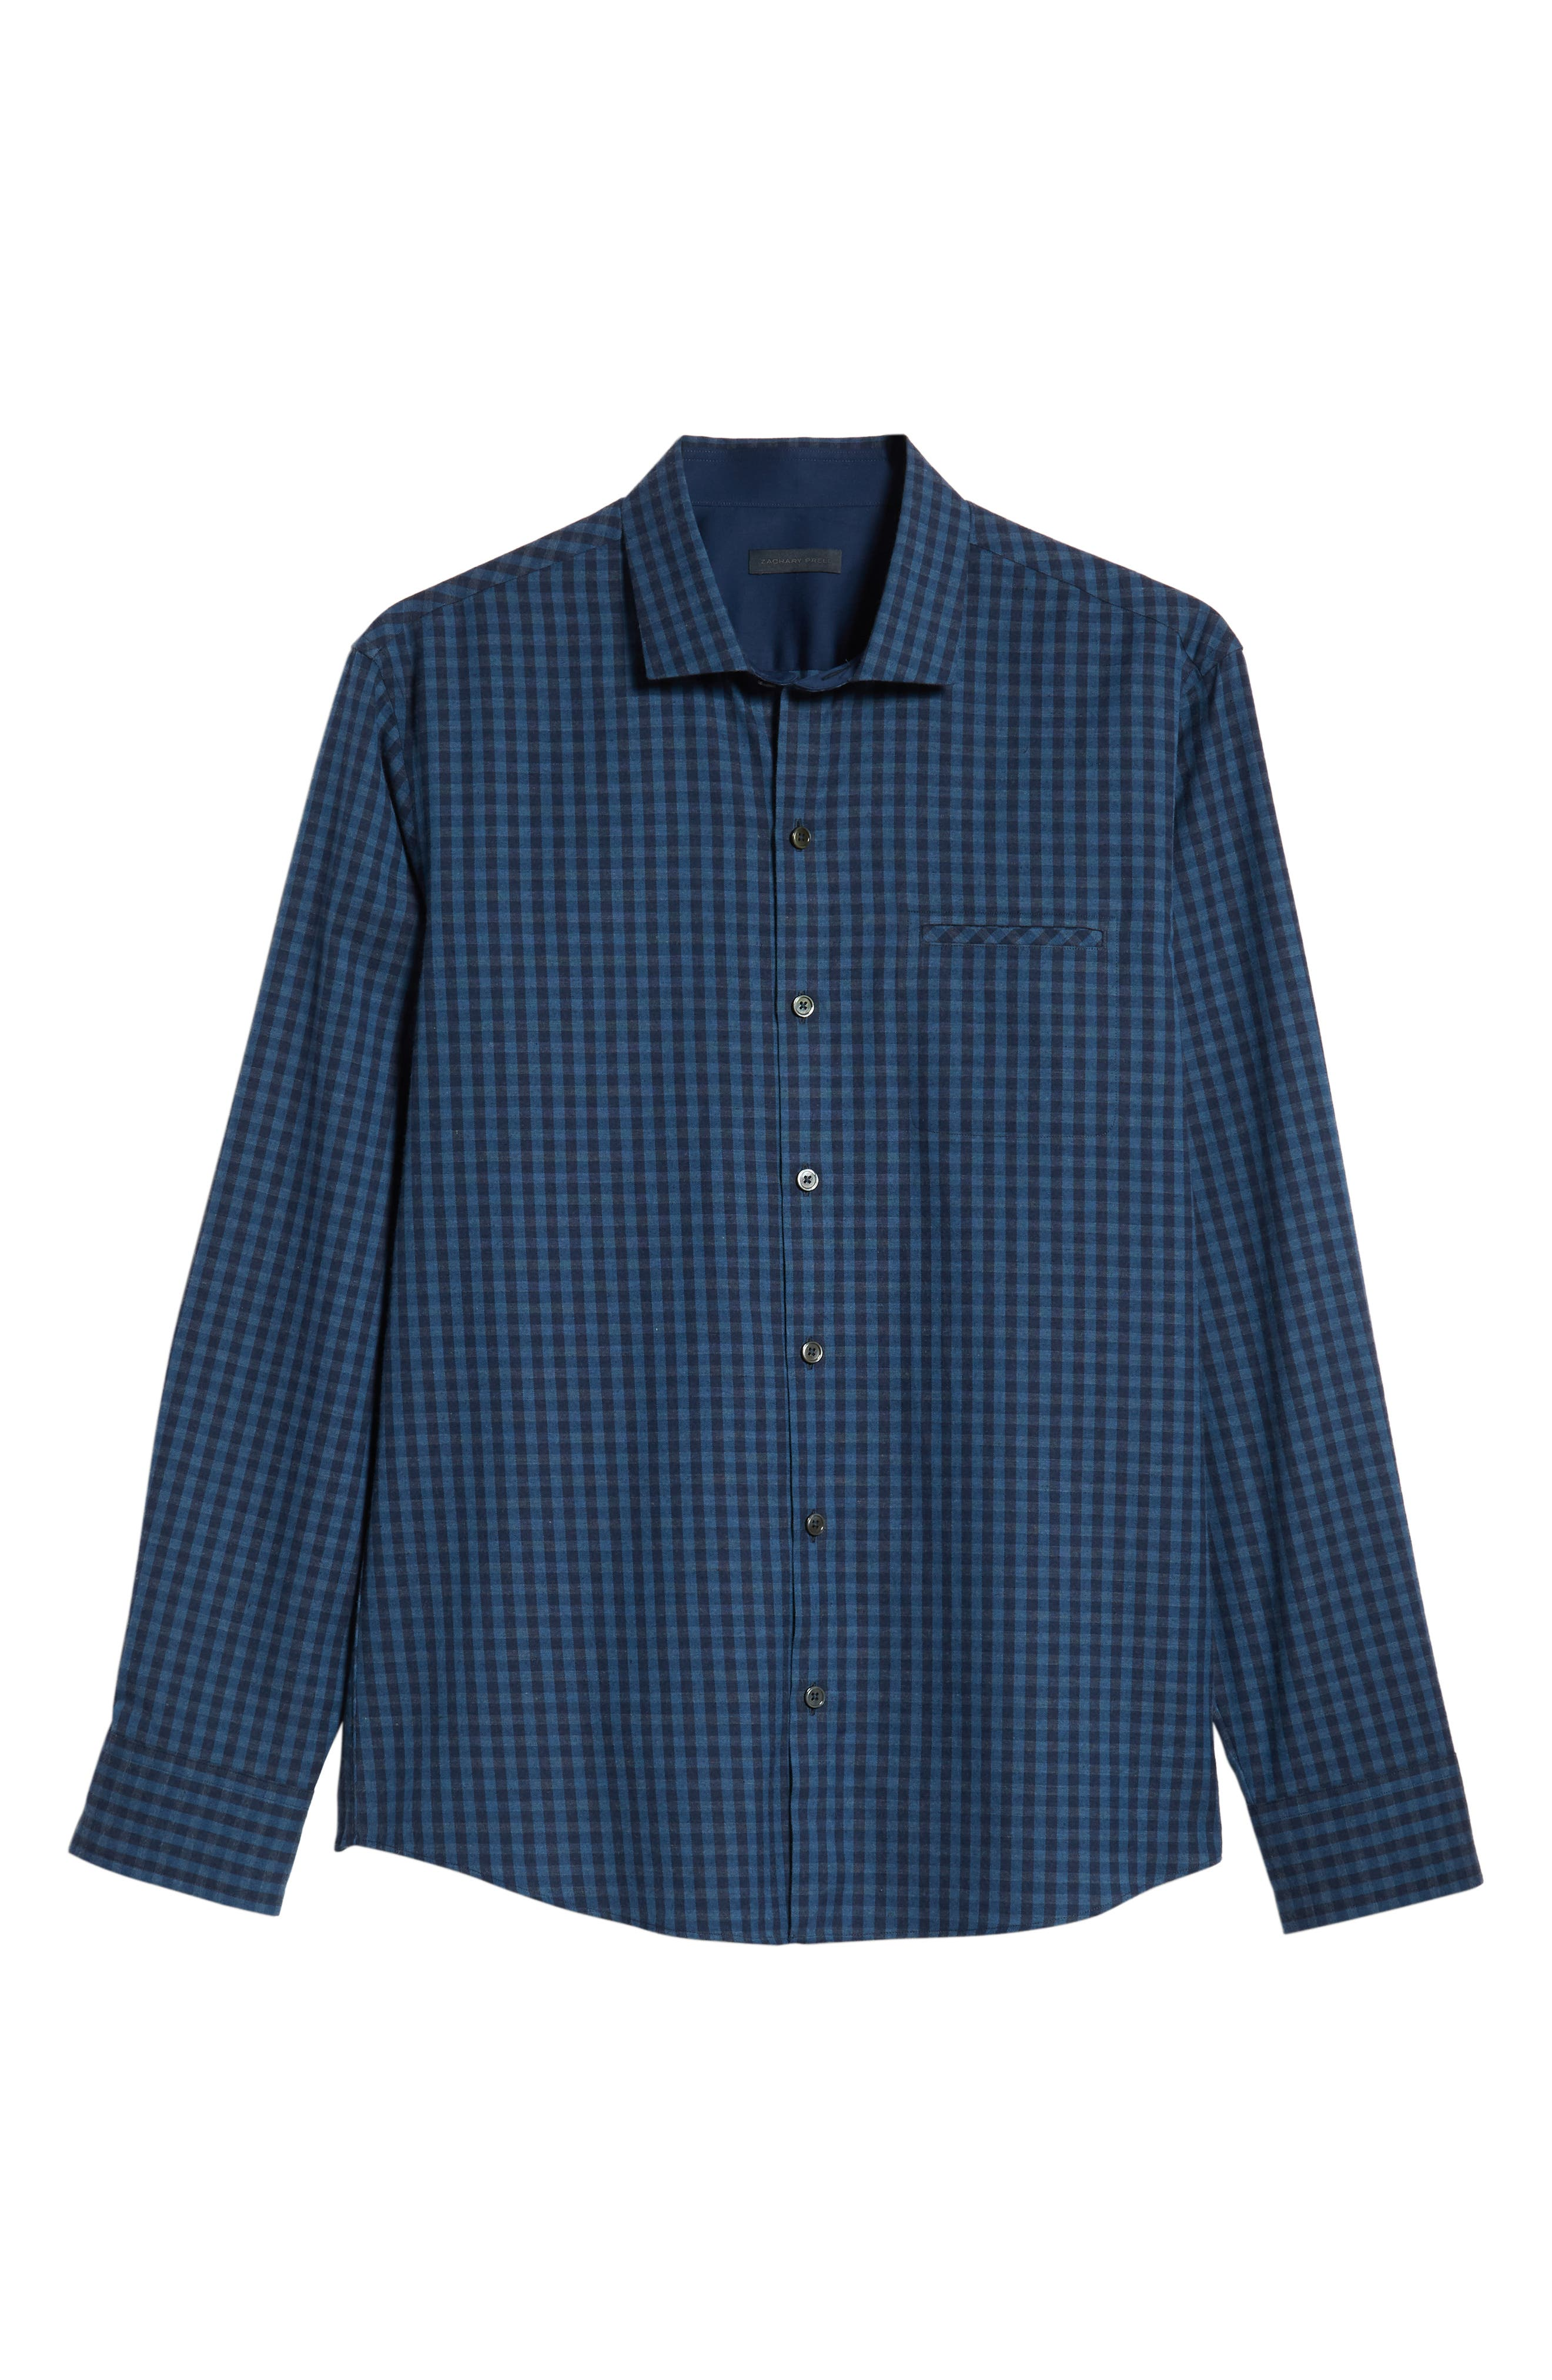 Santana Check Sport Shirt,                             Alternate thumbnail 5, color,                             DARK BLUE